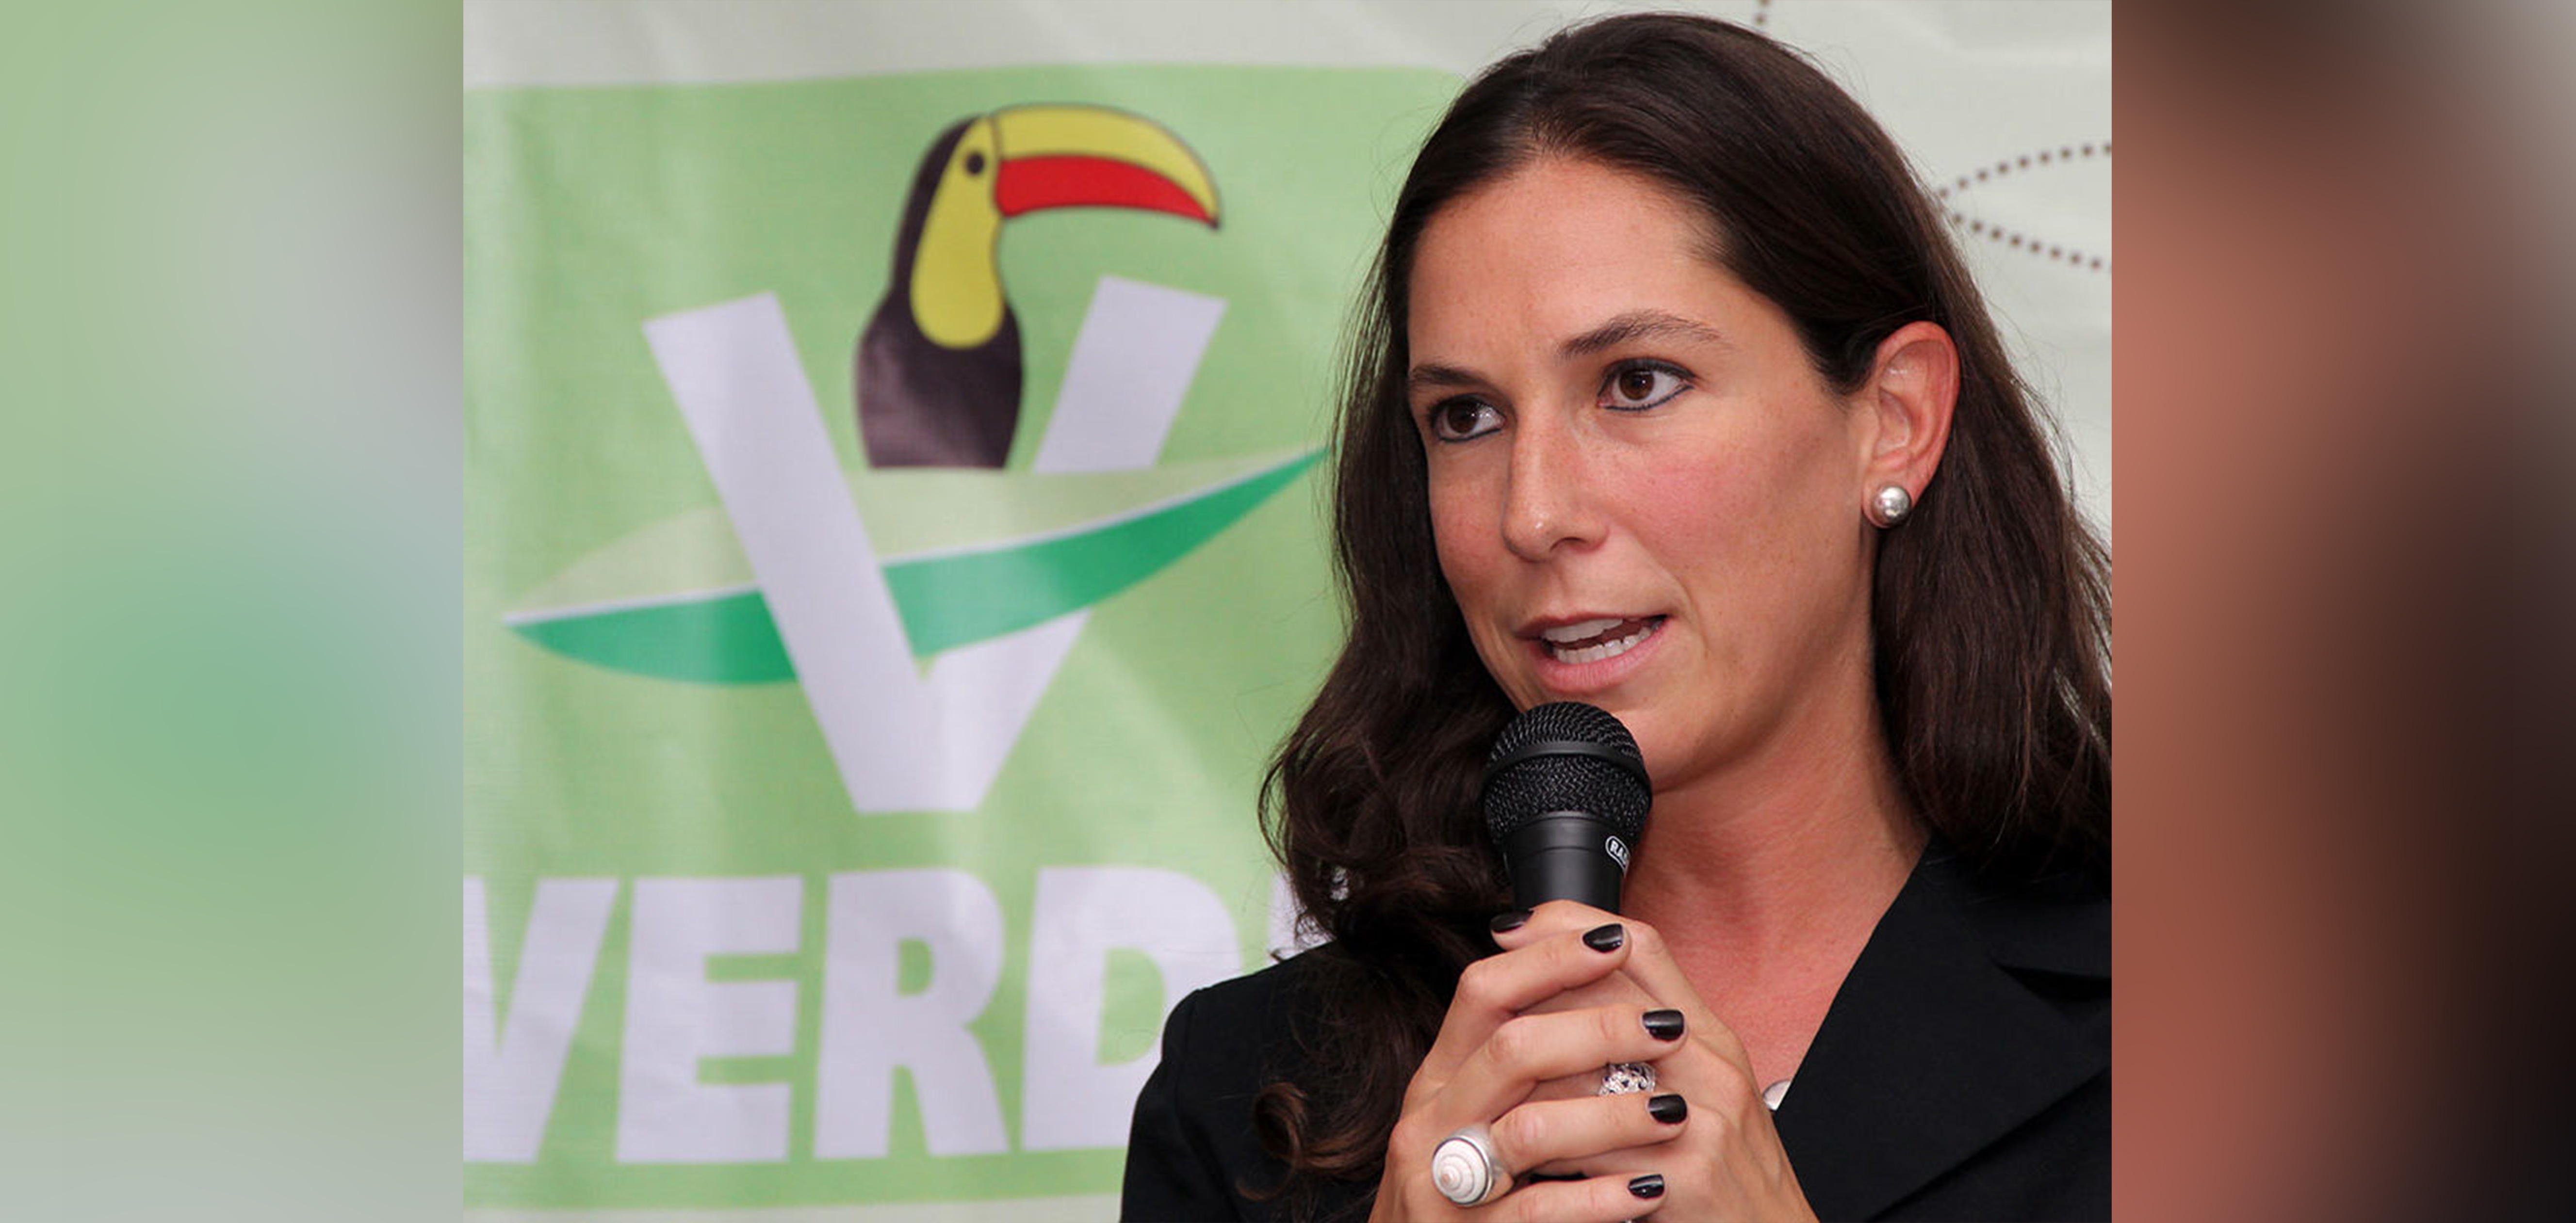 Candidata del partido verde ofrece recuperar agua for Recuperar agua piscina verde